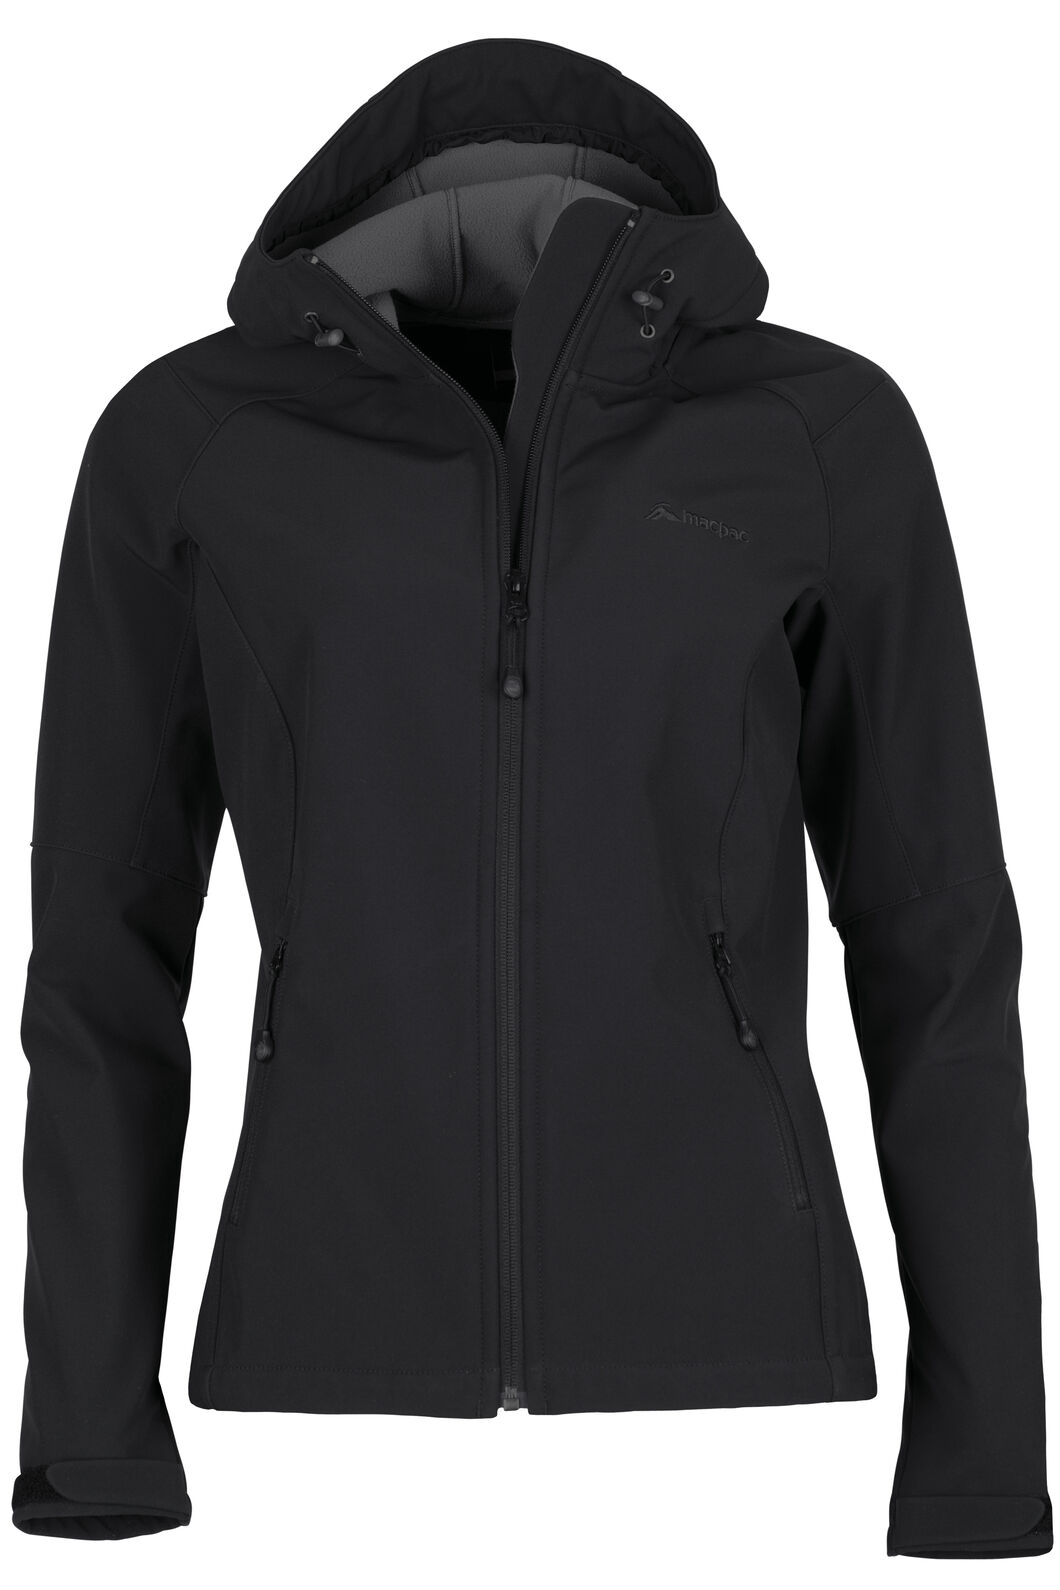 Sabre Hooded Softshell Jacket - Women's, Black, hi-res